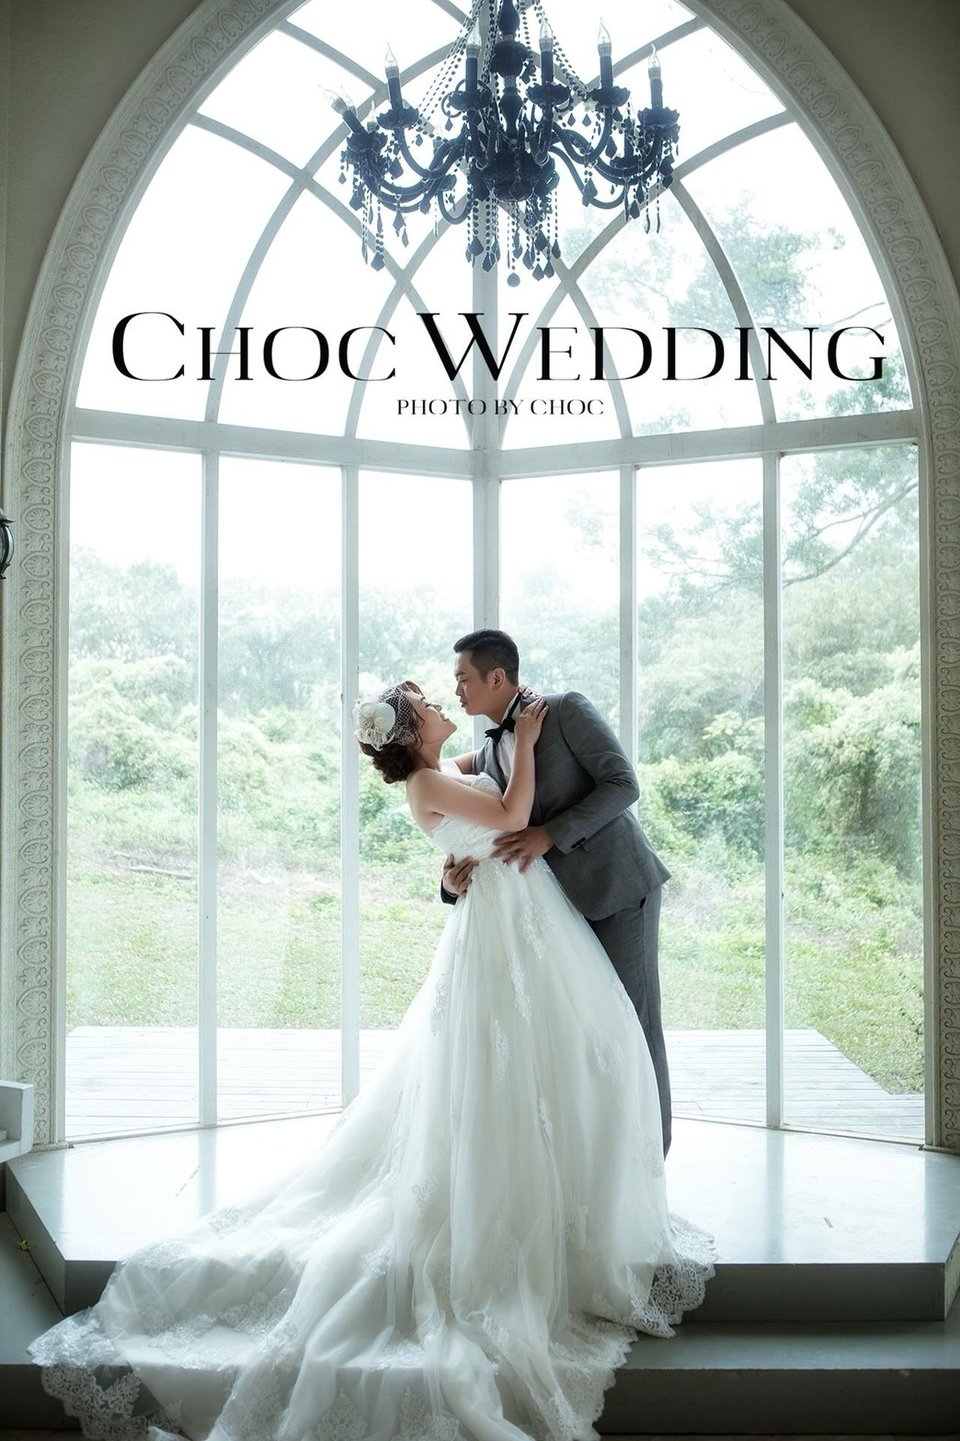 CHOC wedding,真心推薦-棉花糖新娘(女孩)看這裡!!自然最真實的質感婚紗照,來自神攝手-橋克